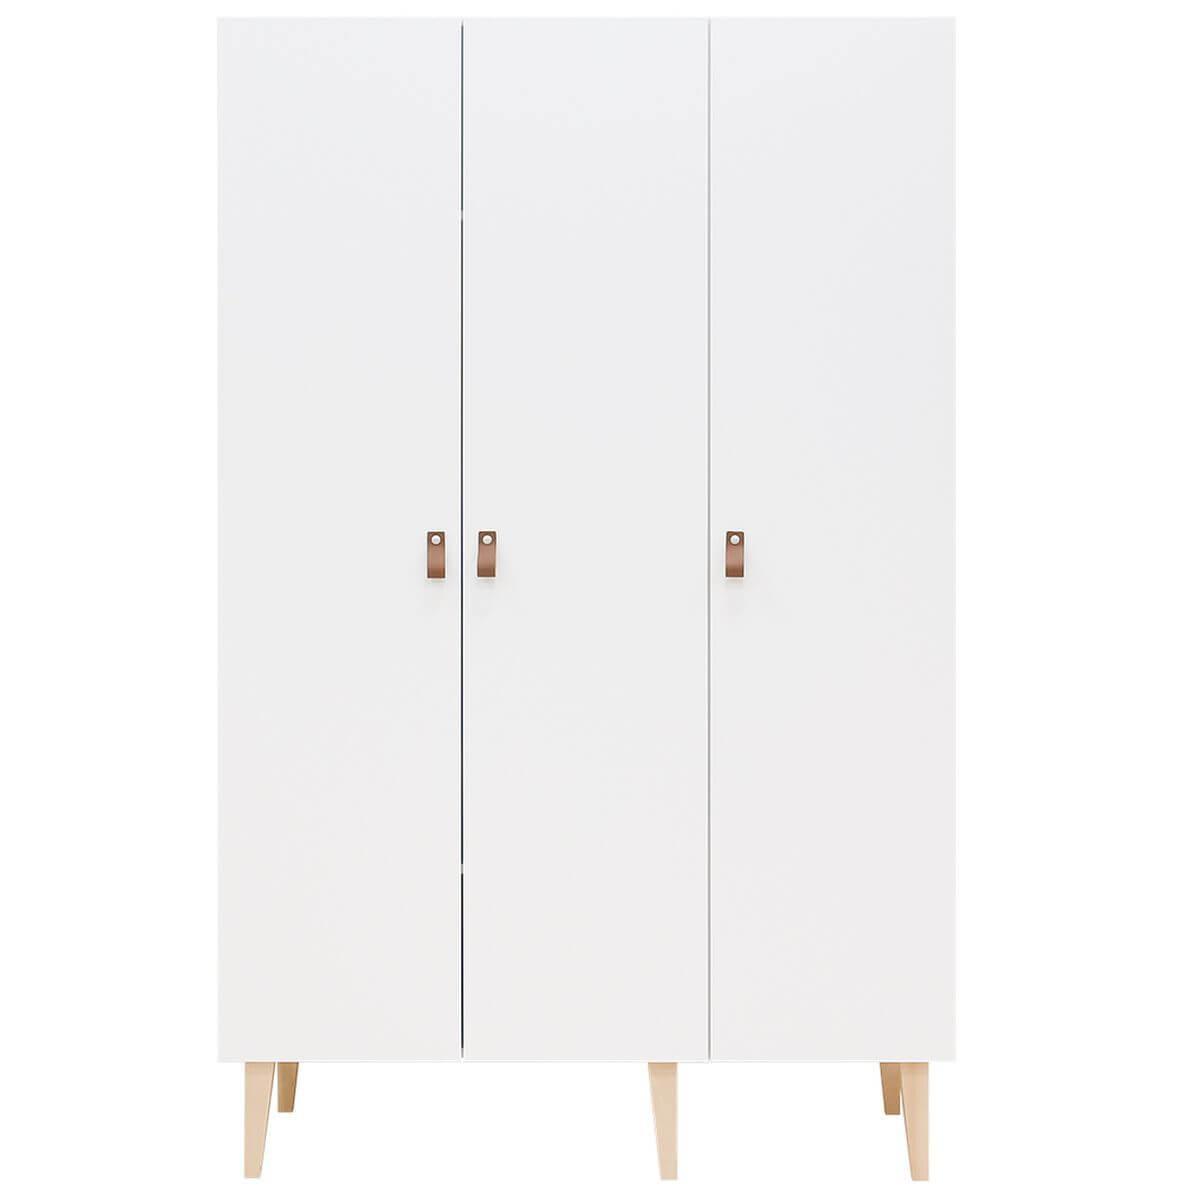 Armoire 3 portes INDY Bopita blanc-naturel